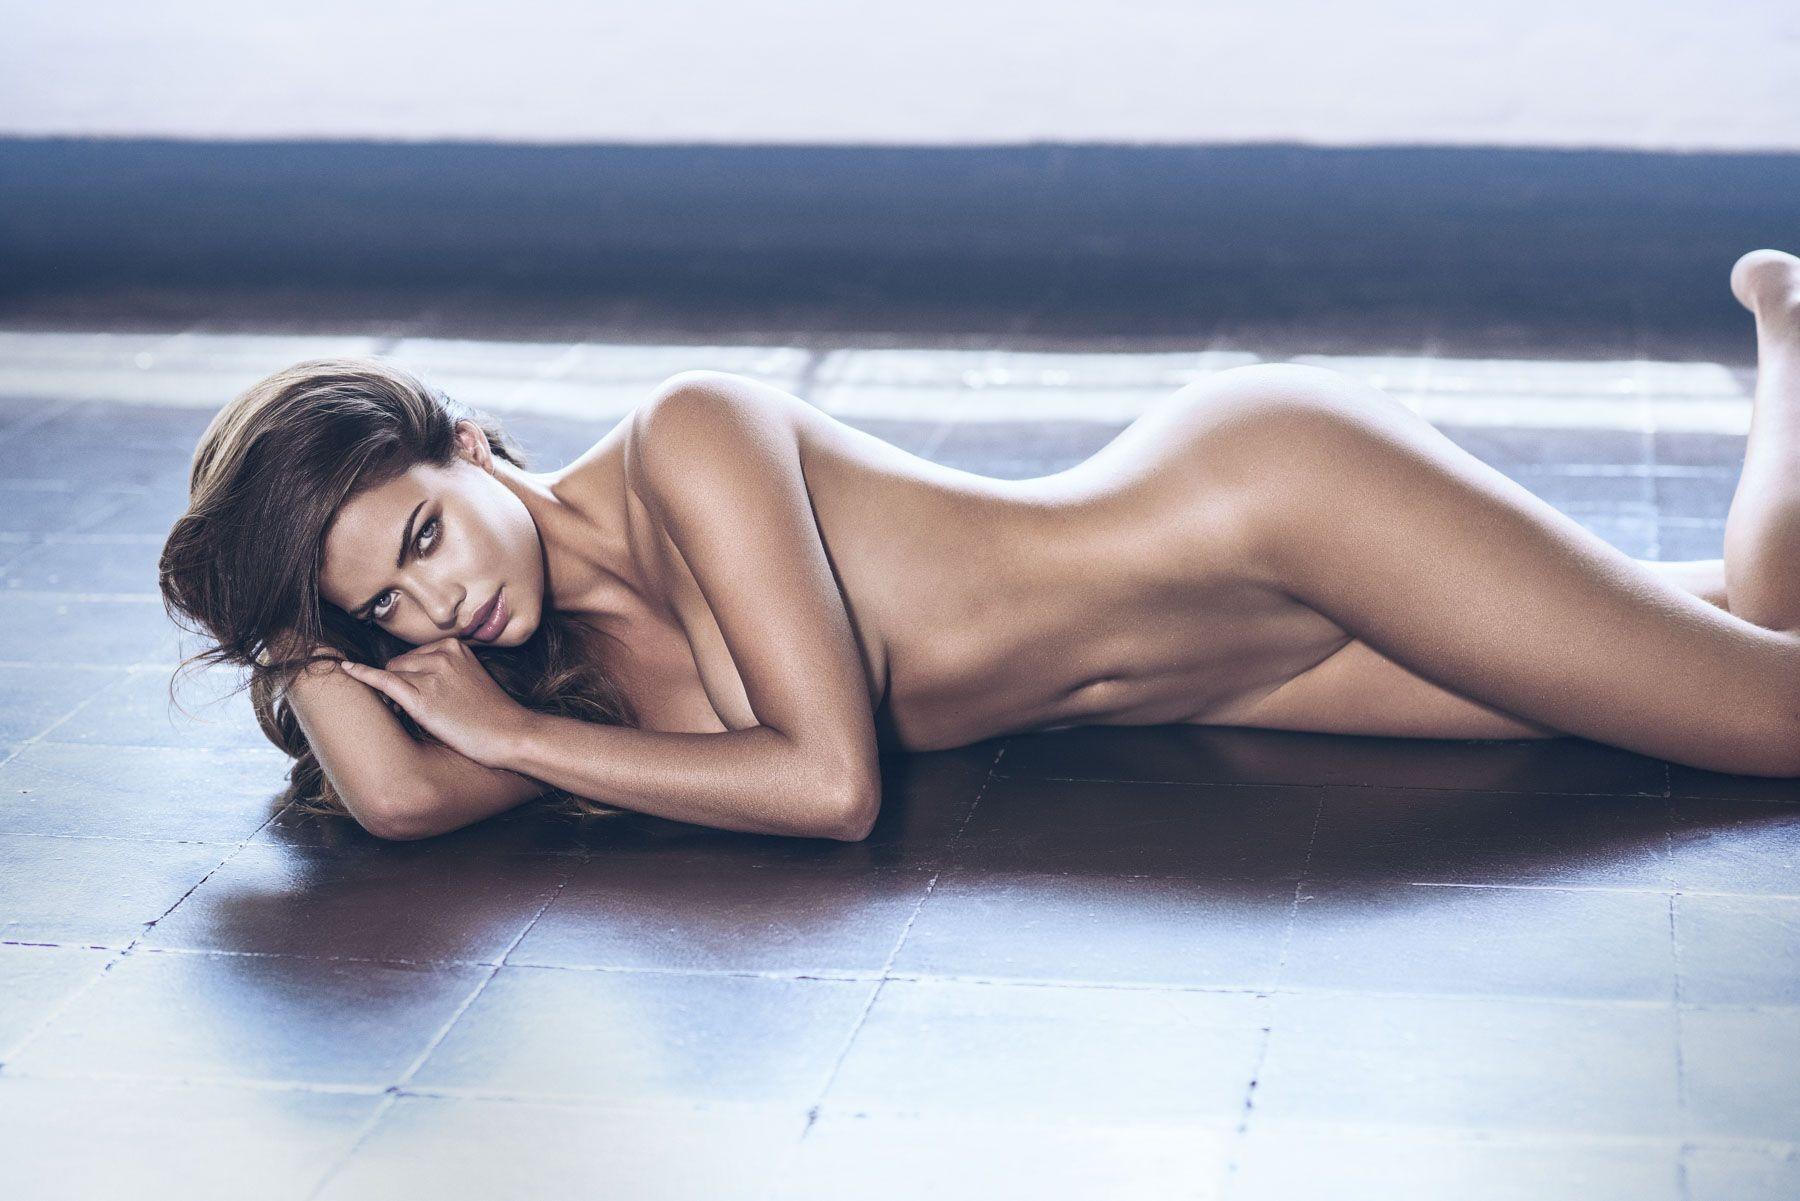 Linda bollea nude